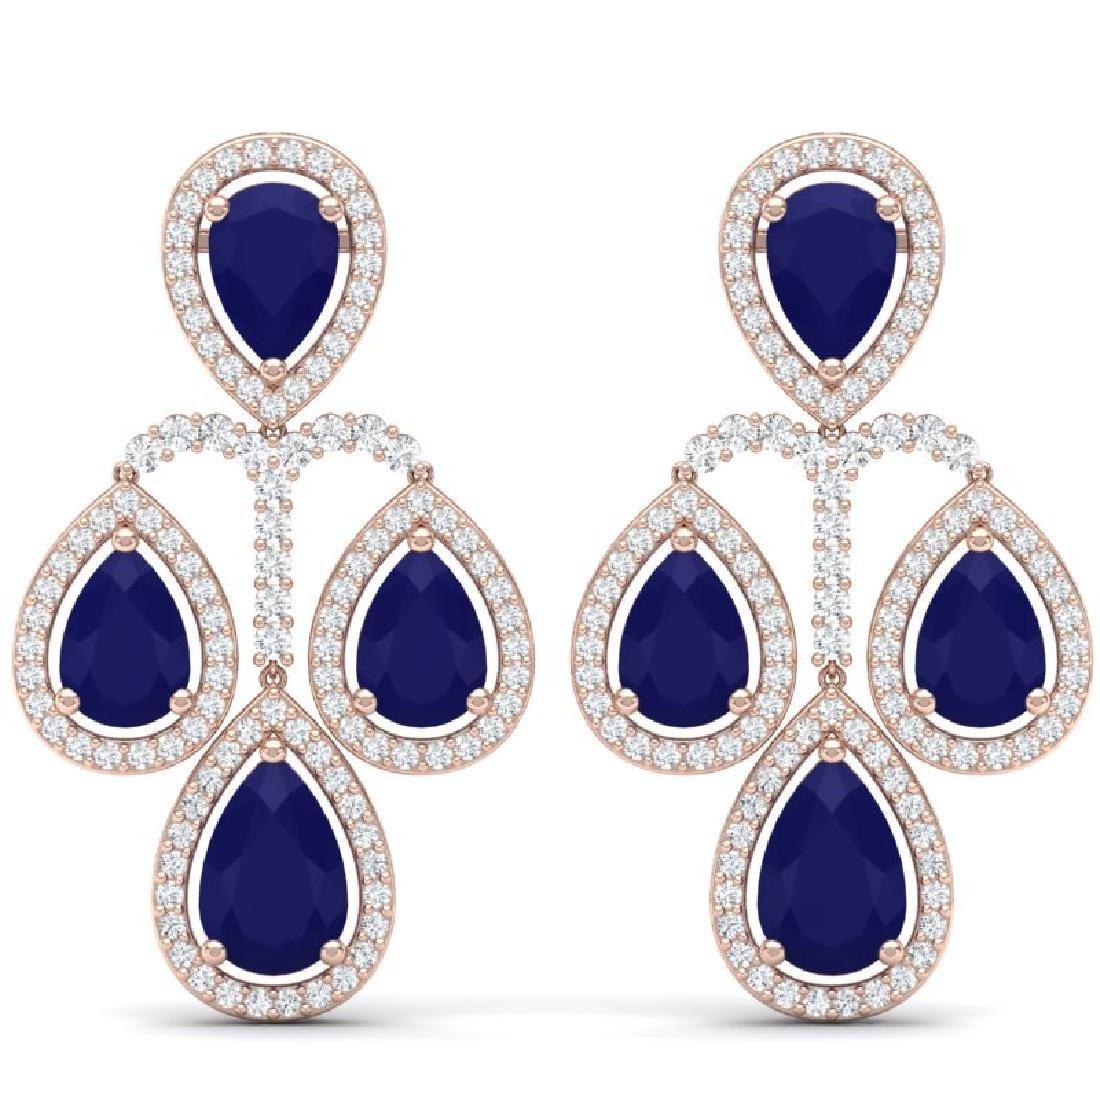 29.23 CTW Royalty Sapphire & VS Diamond Earrings 18K